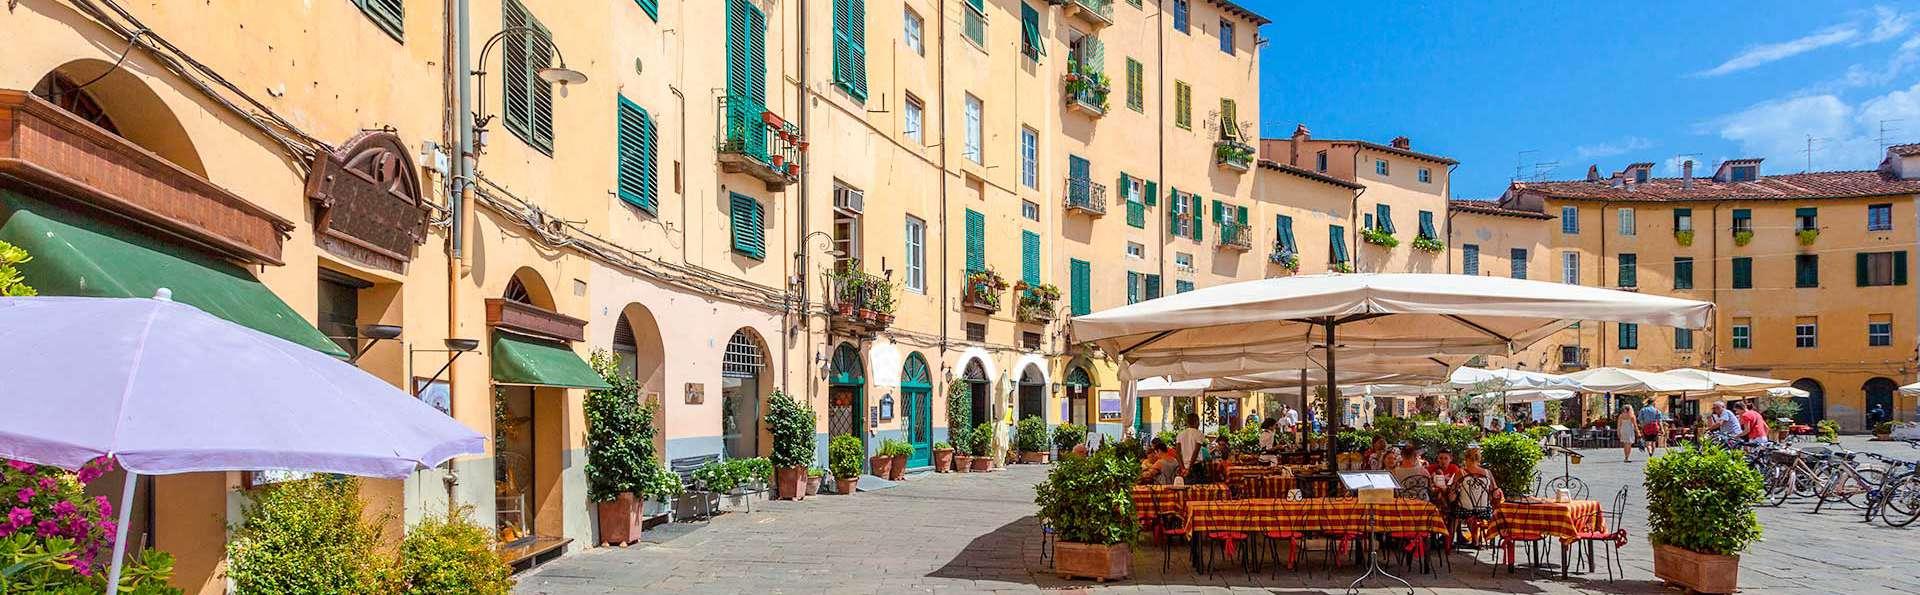 Best Western Grand Hotel Guinigi - EDIT_DESTINATION_03.jpg